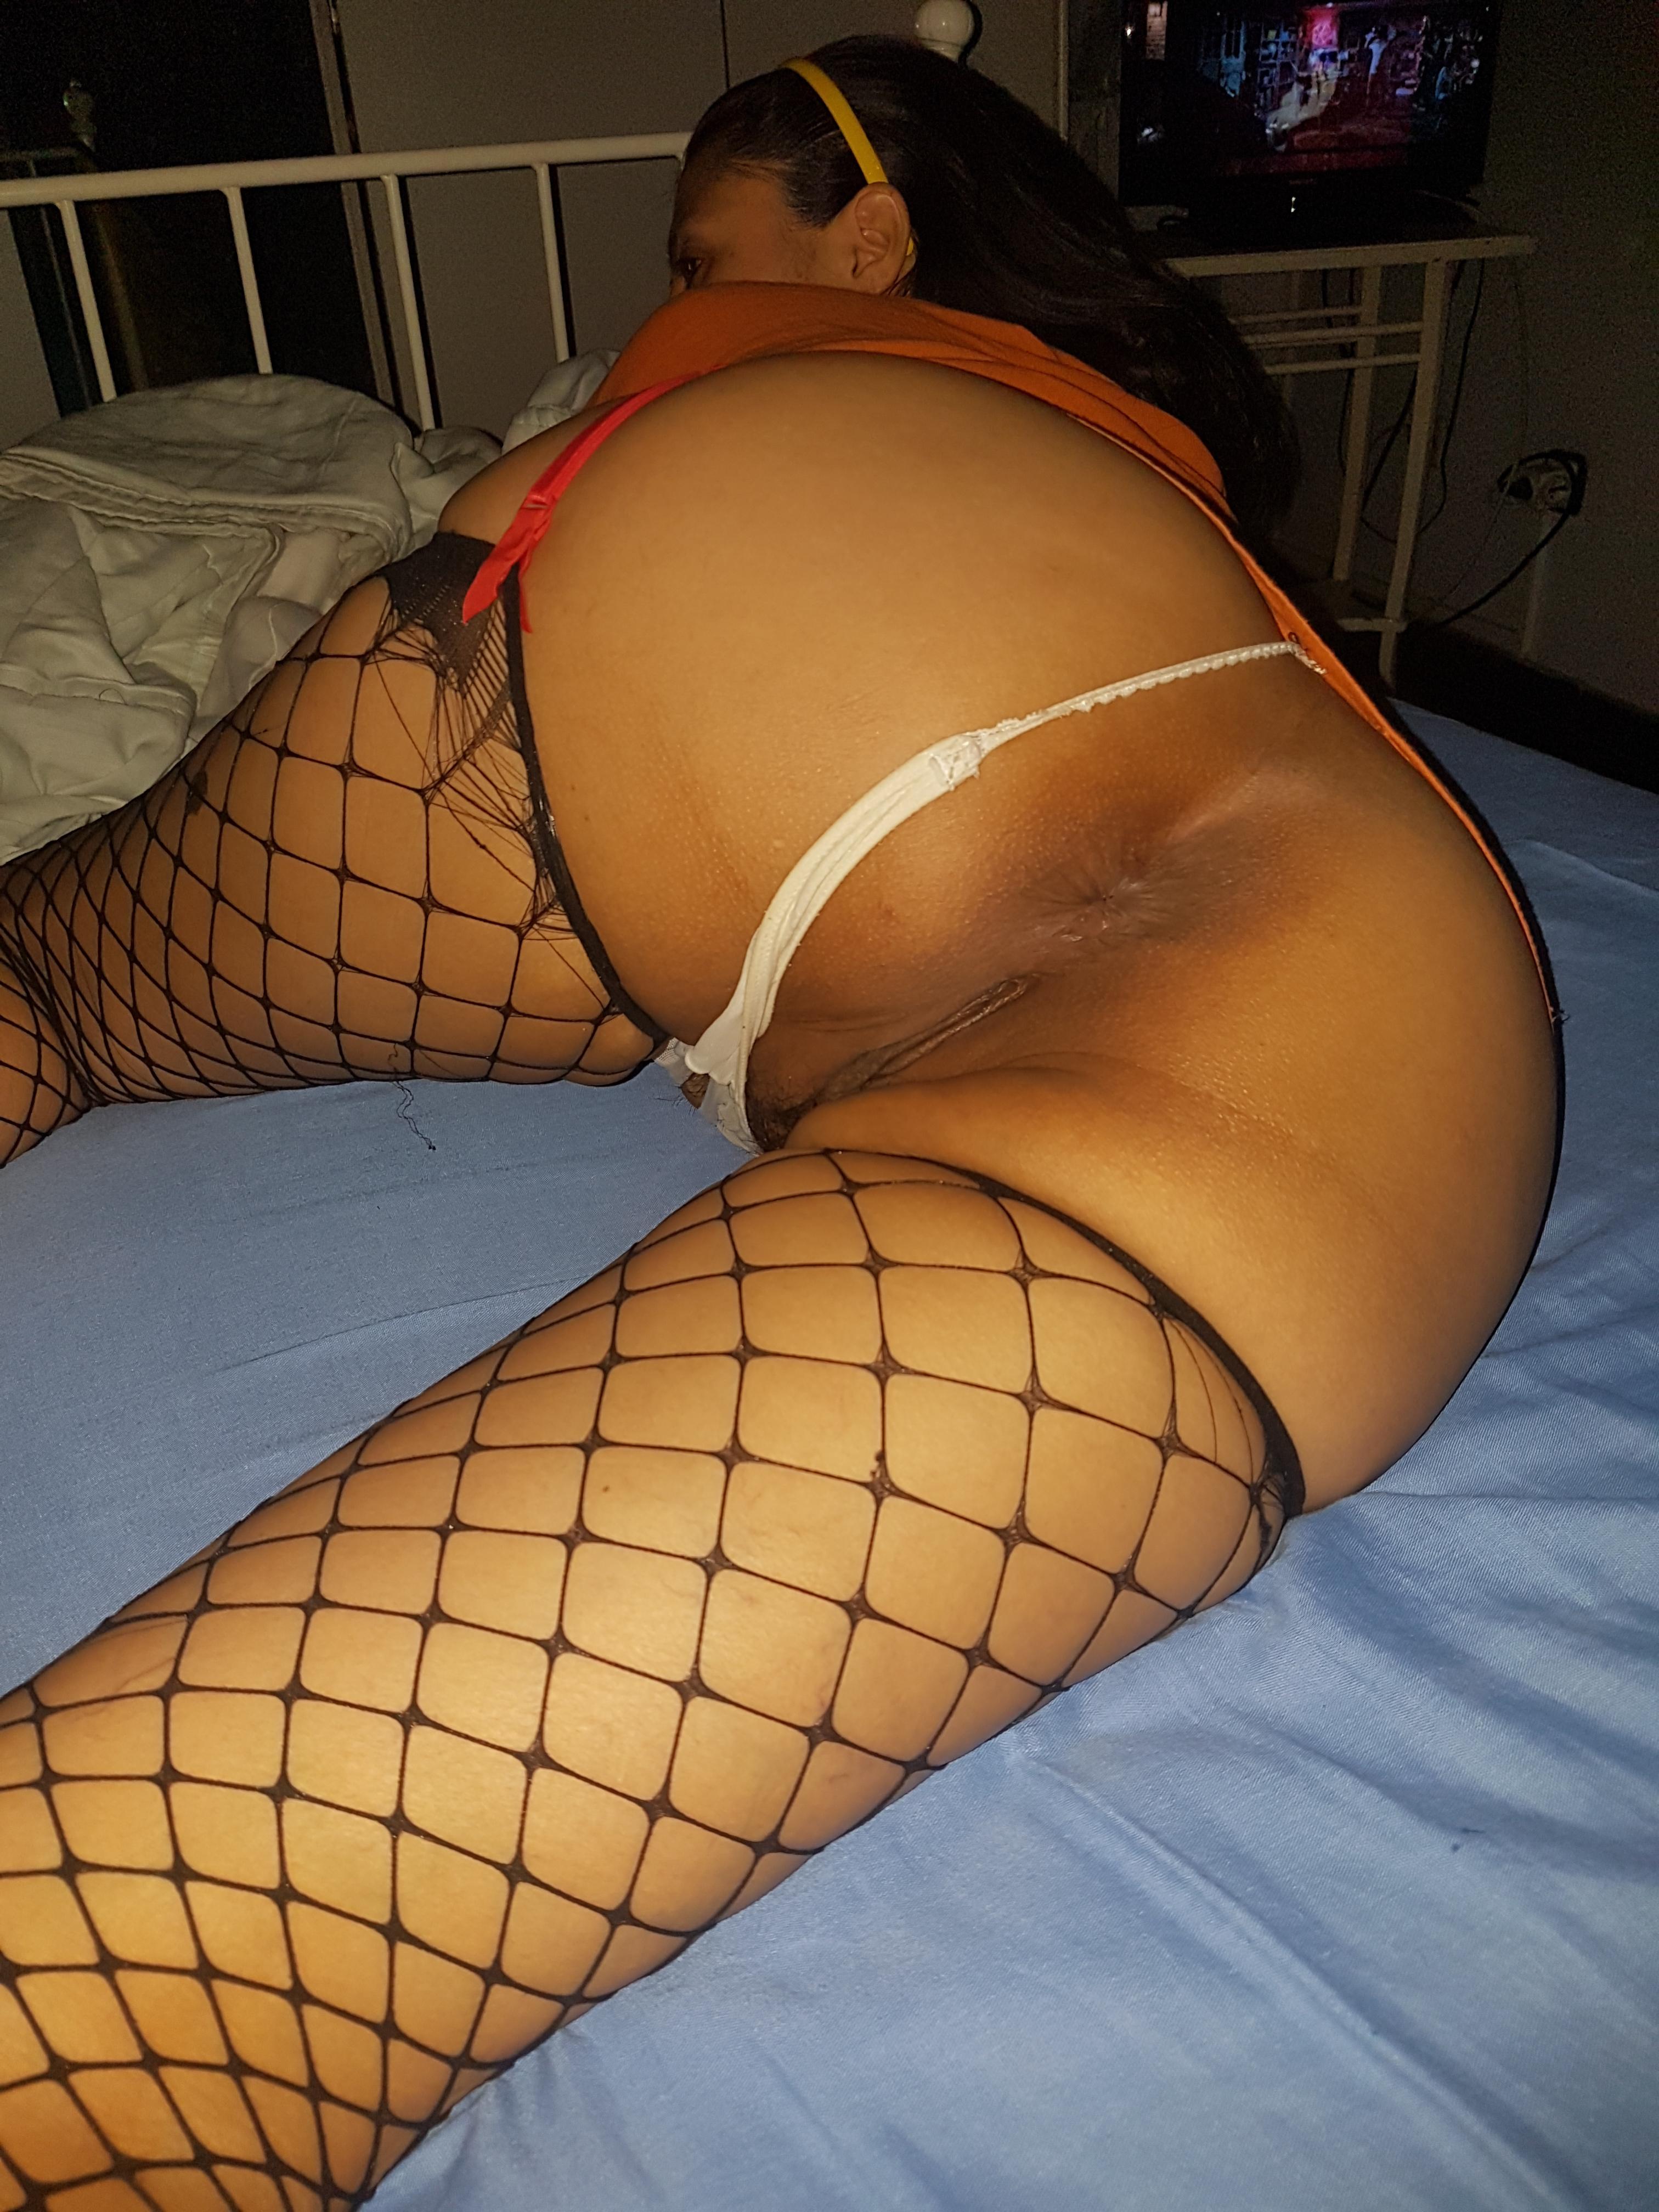 31a205eed0 Liguero porn - Mi mujer on yuvutu homemade amateur porn movies and sex  videos jpg 3024x4032